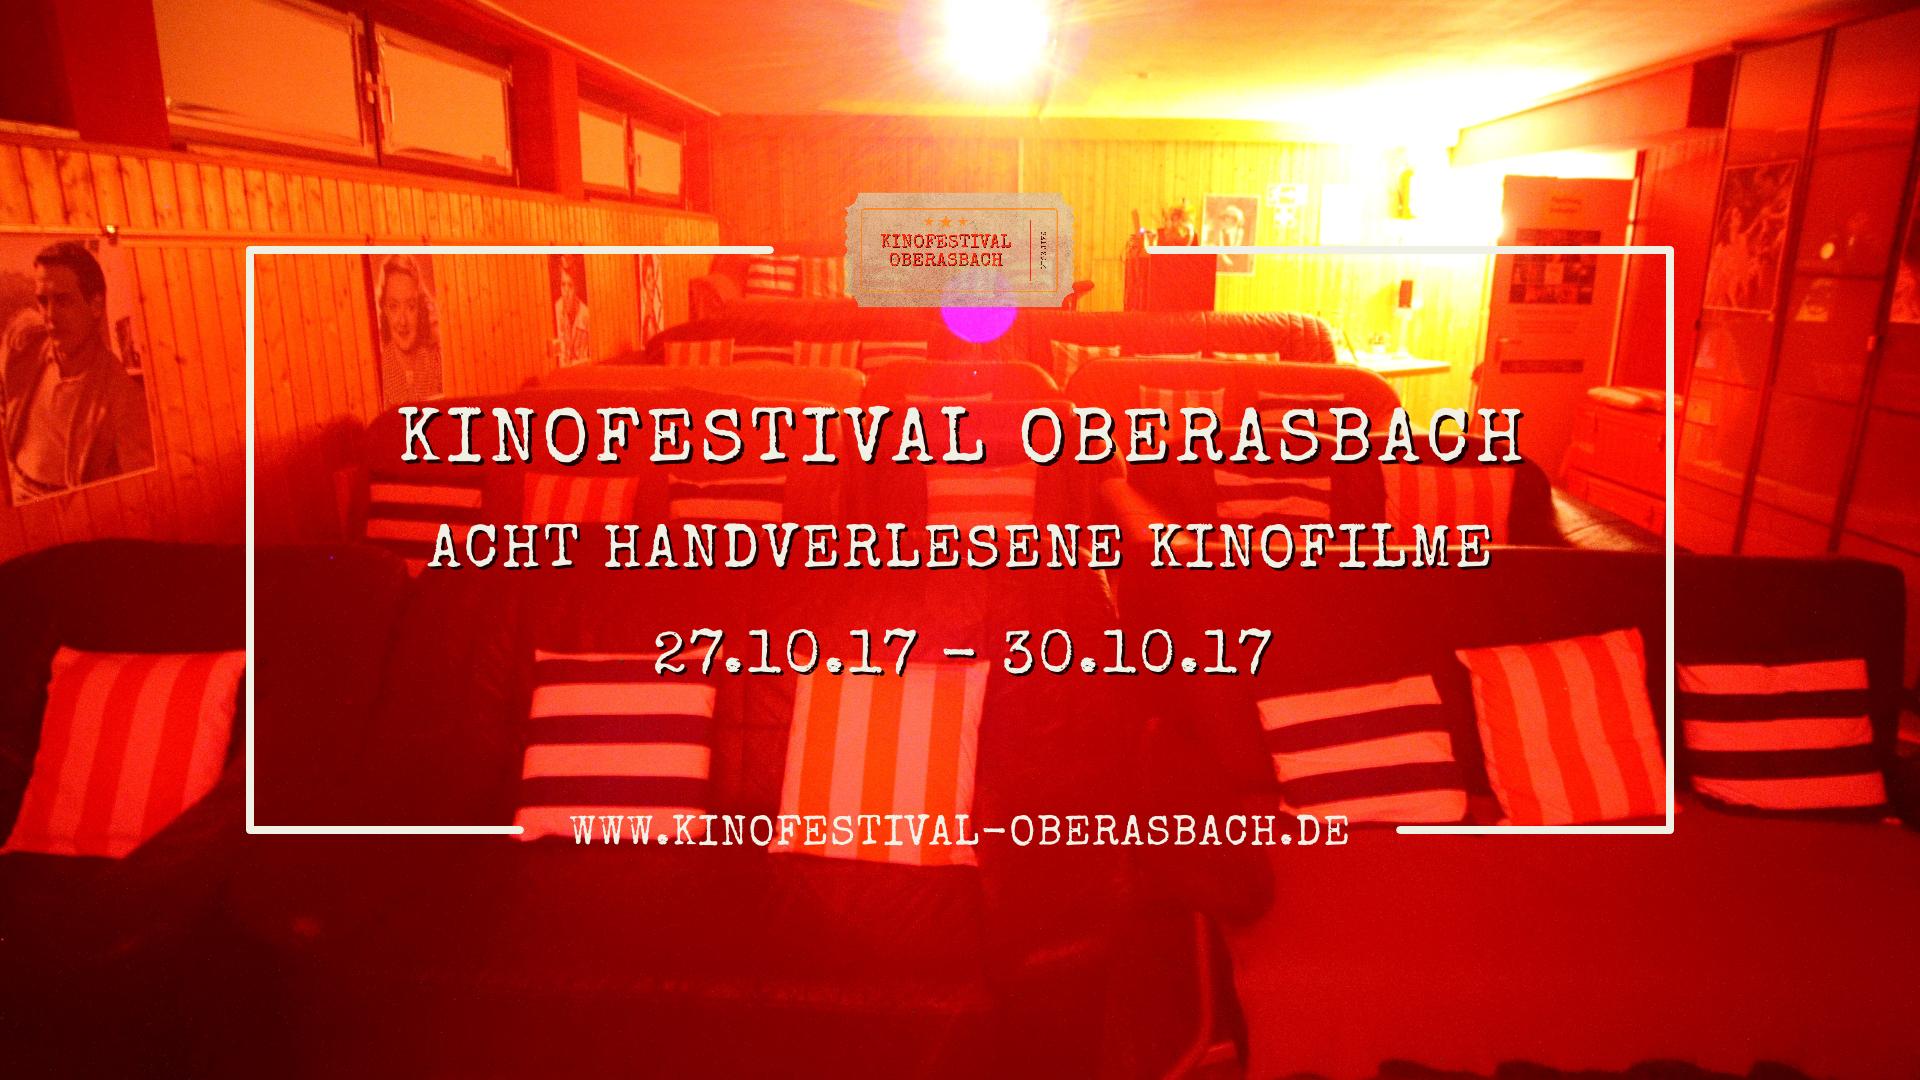 Werbebild Kinofestival Oberasbach